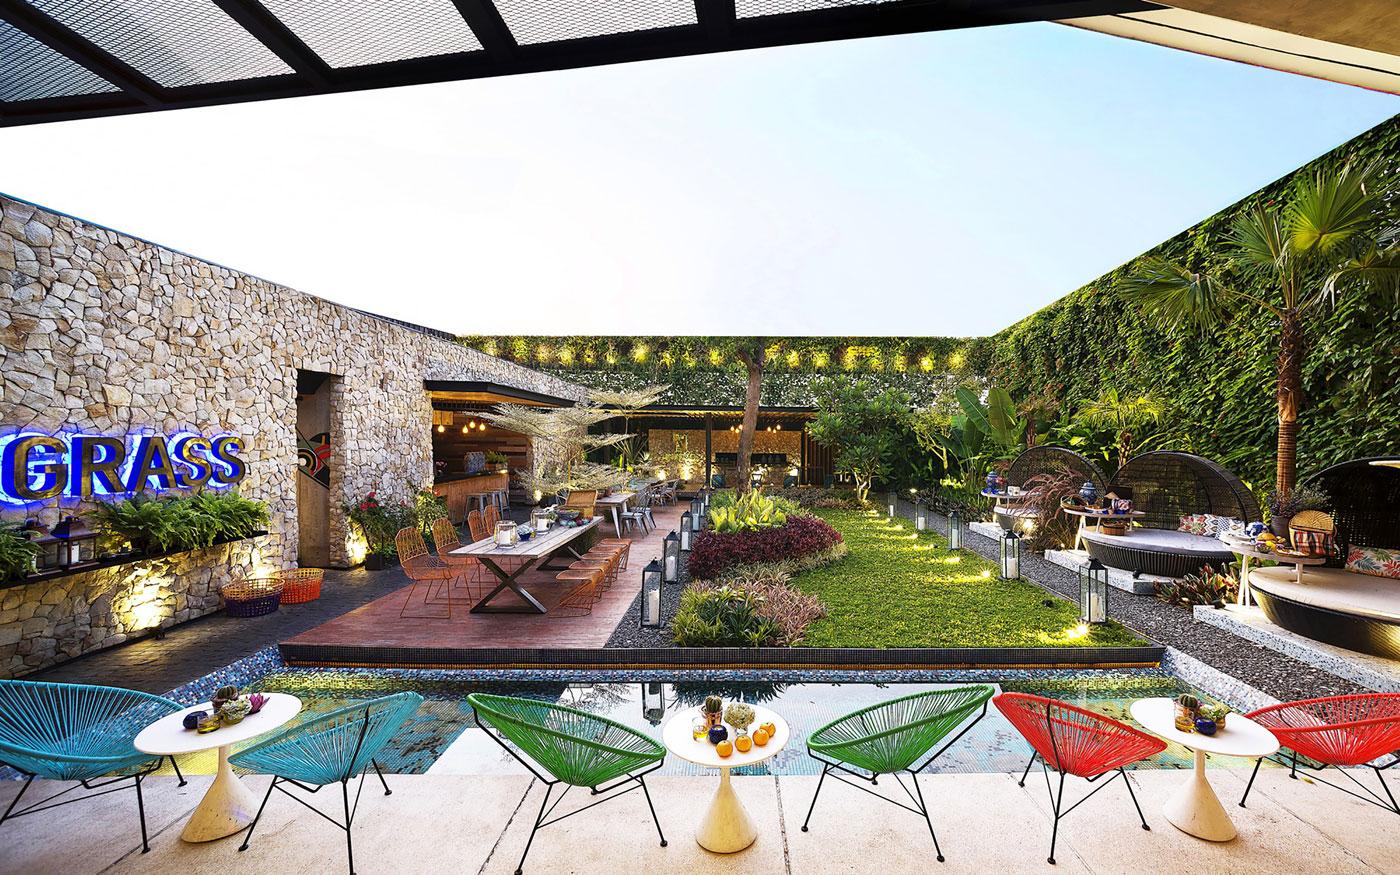 Stylish Tropical Paradise Theme of Lemongrass Restaurant Designed by Einstein & Associates-06